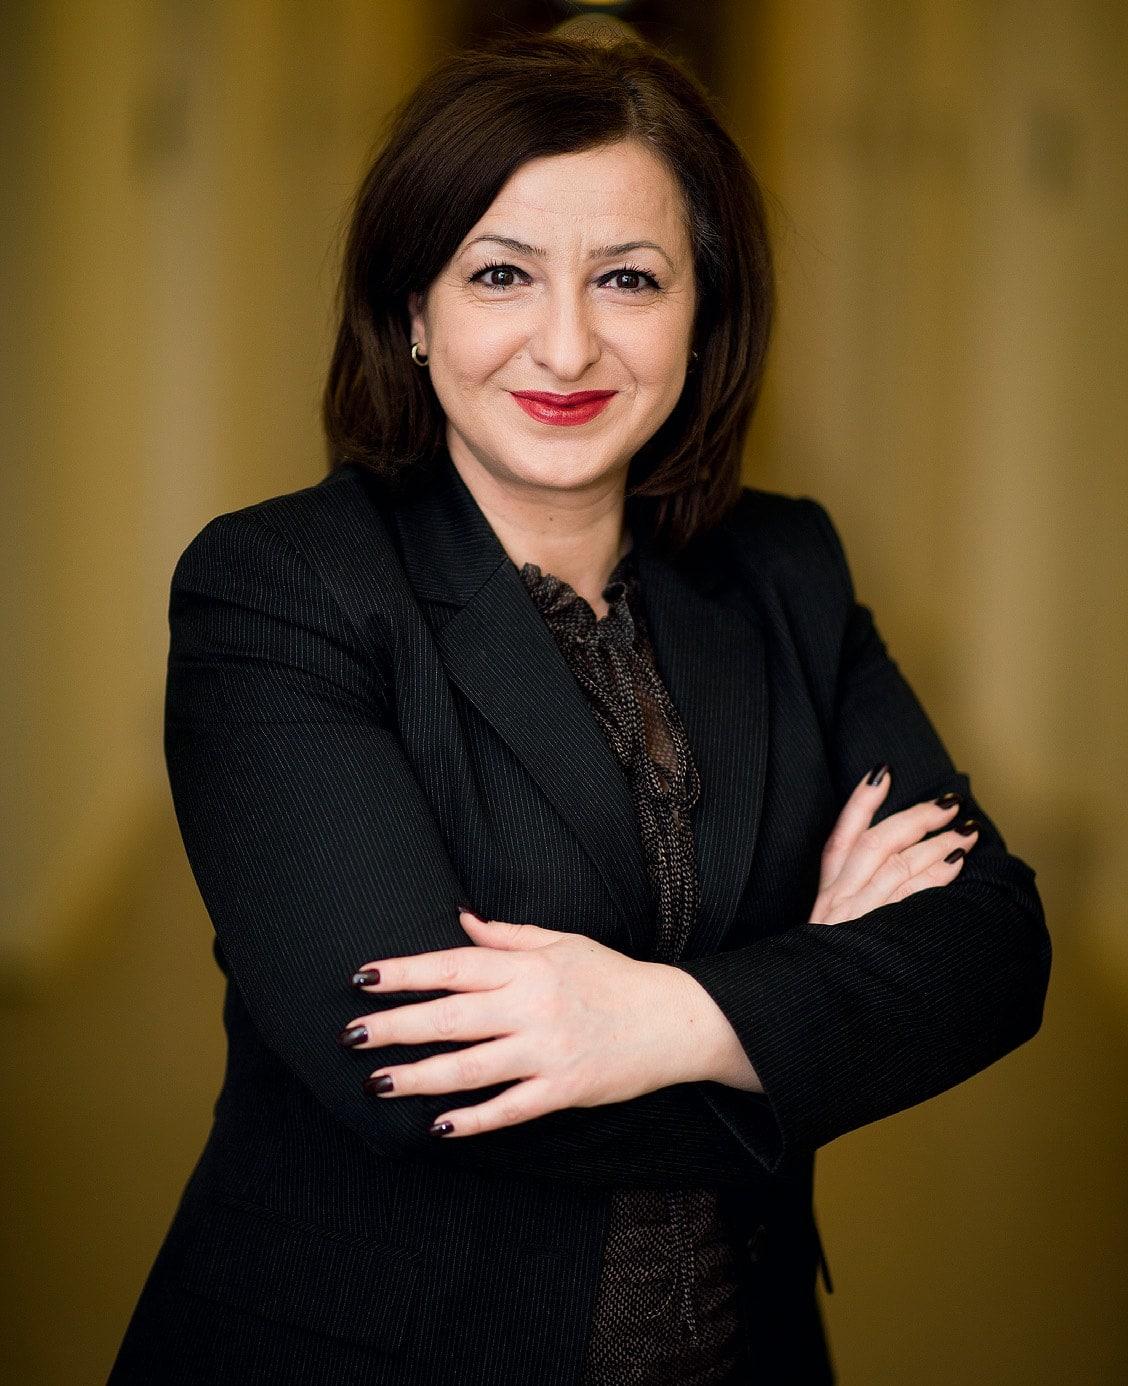 Gleichstellungssenatorin Dilek Kalayci